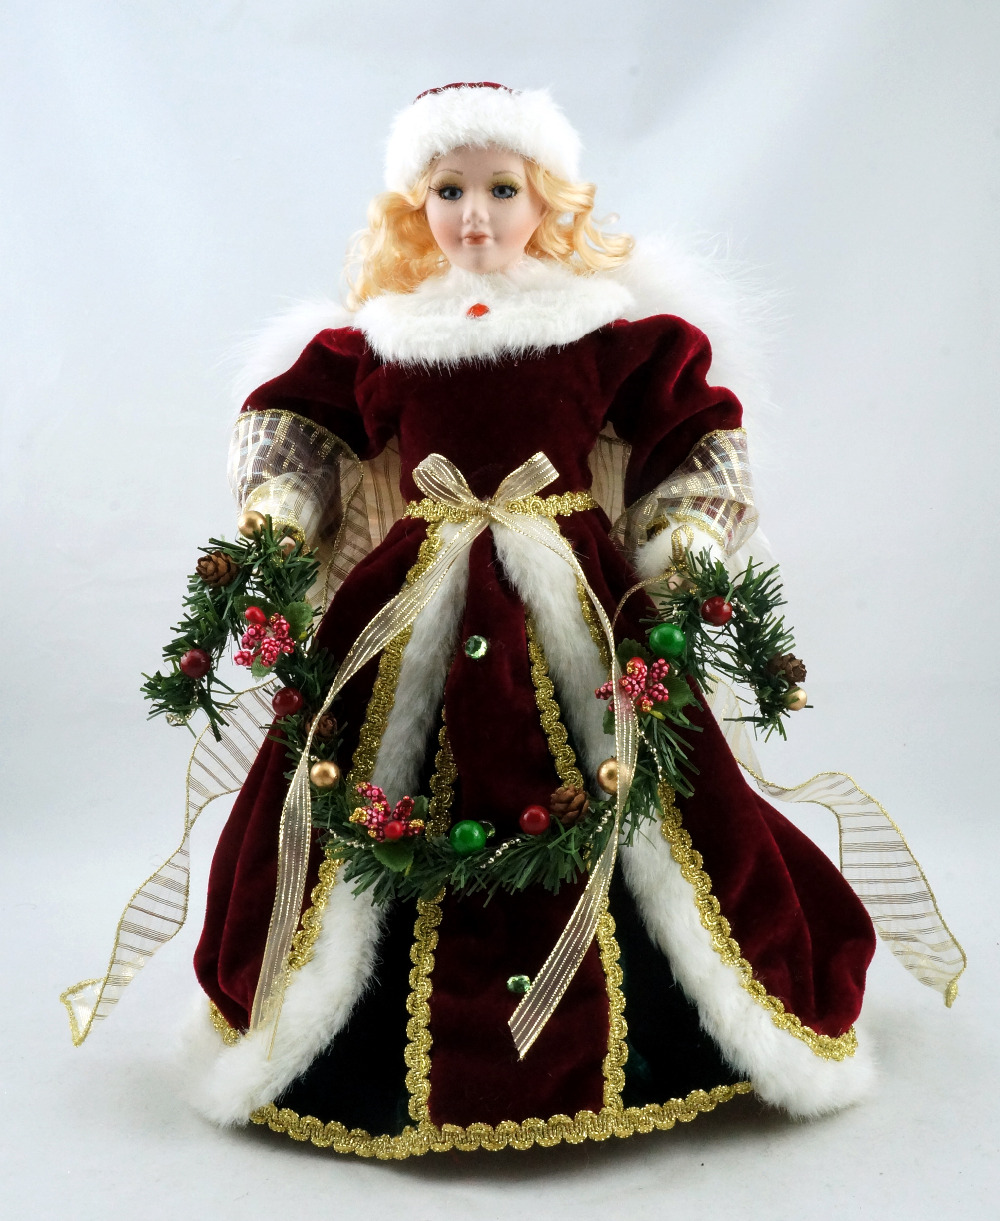 cosette edle weihnachtsdekoration engel porzellan puppe. Black Bedroom Furniture Sets. Home Design Ideas